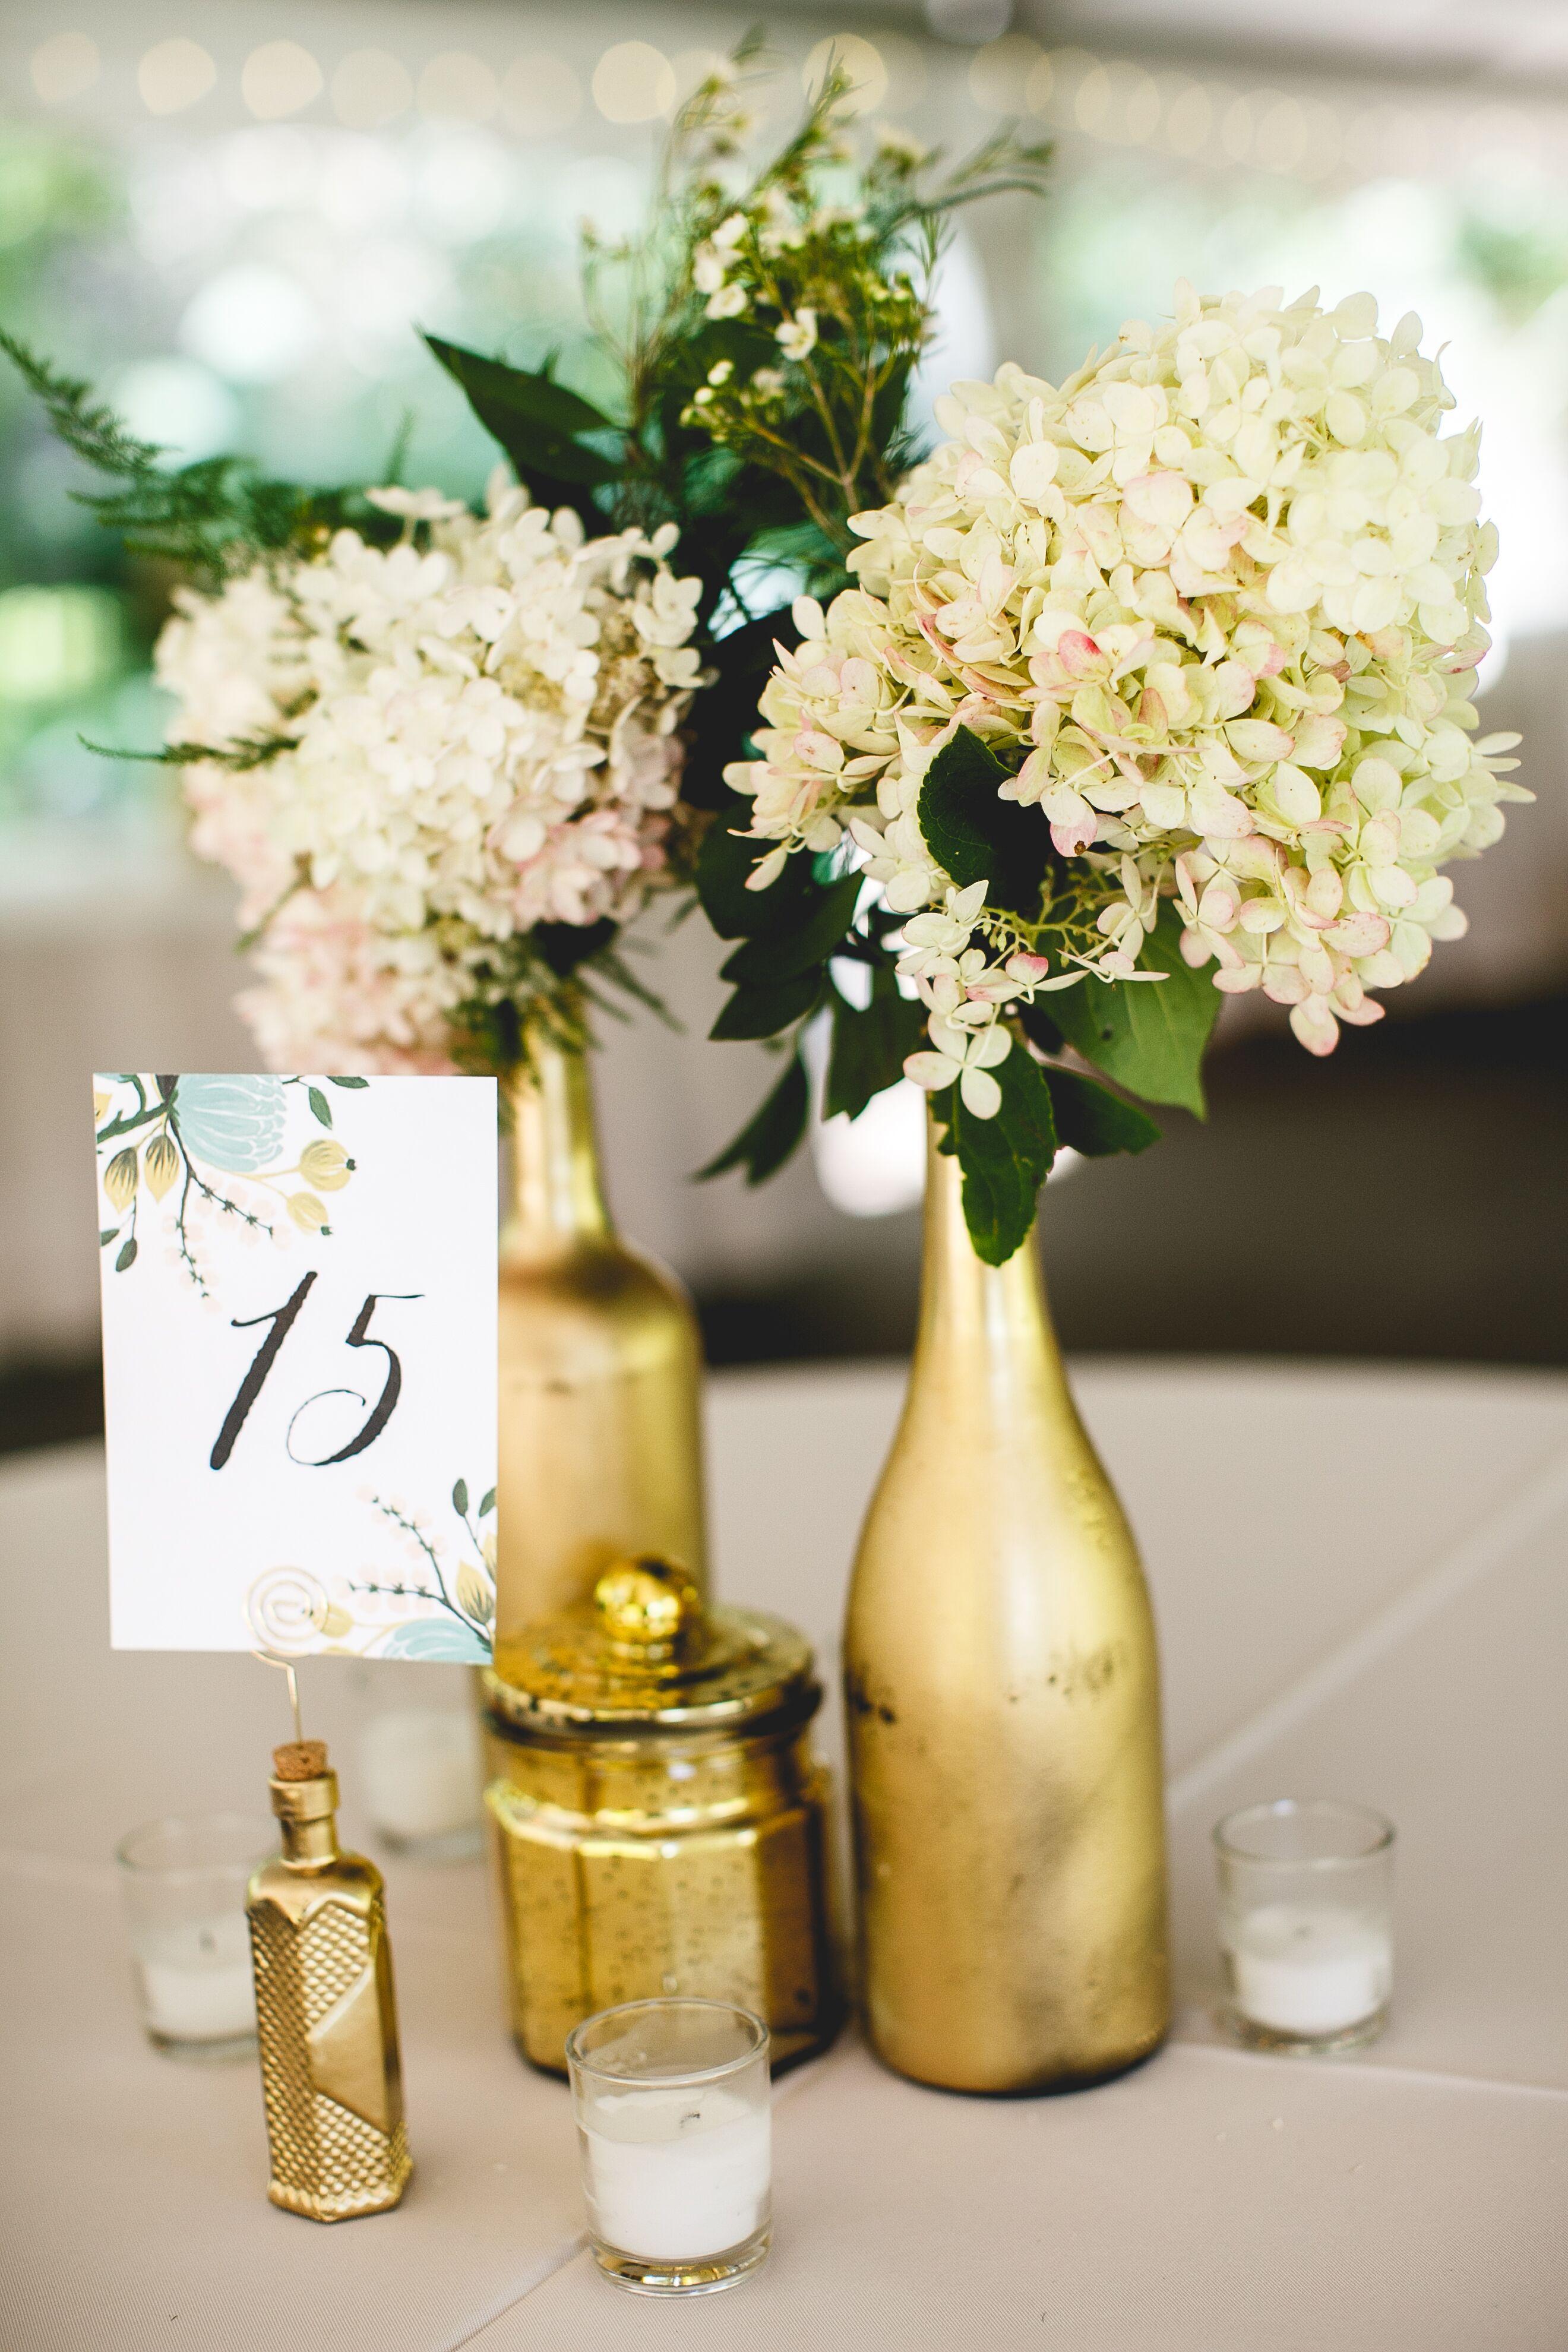 Diy Gold Spray Painted Wine Bottle Vases